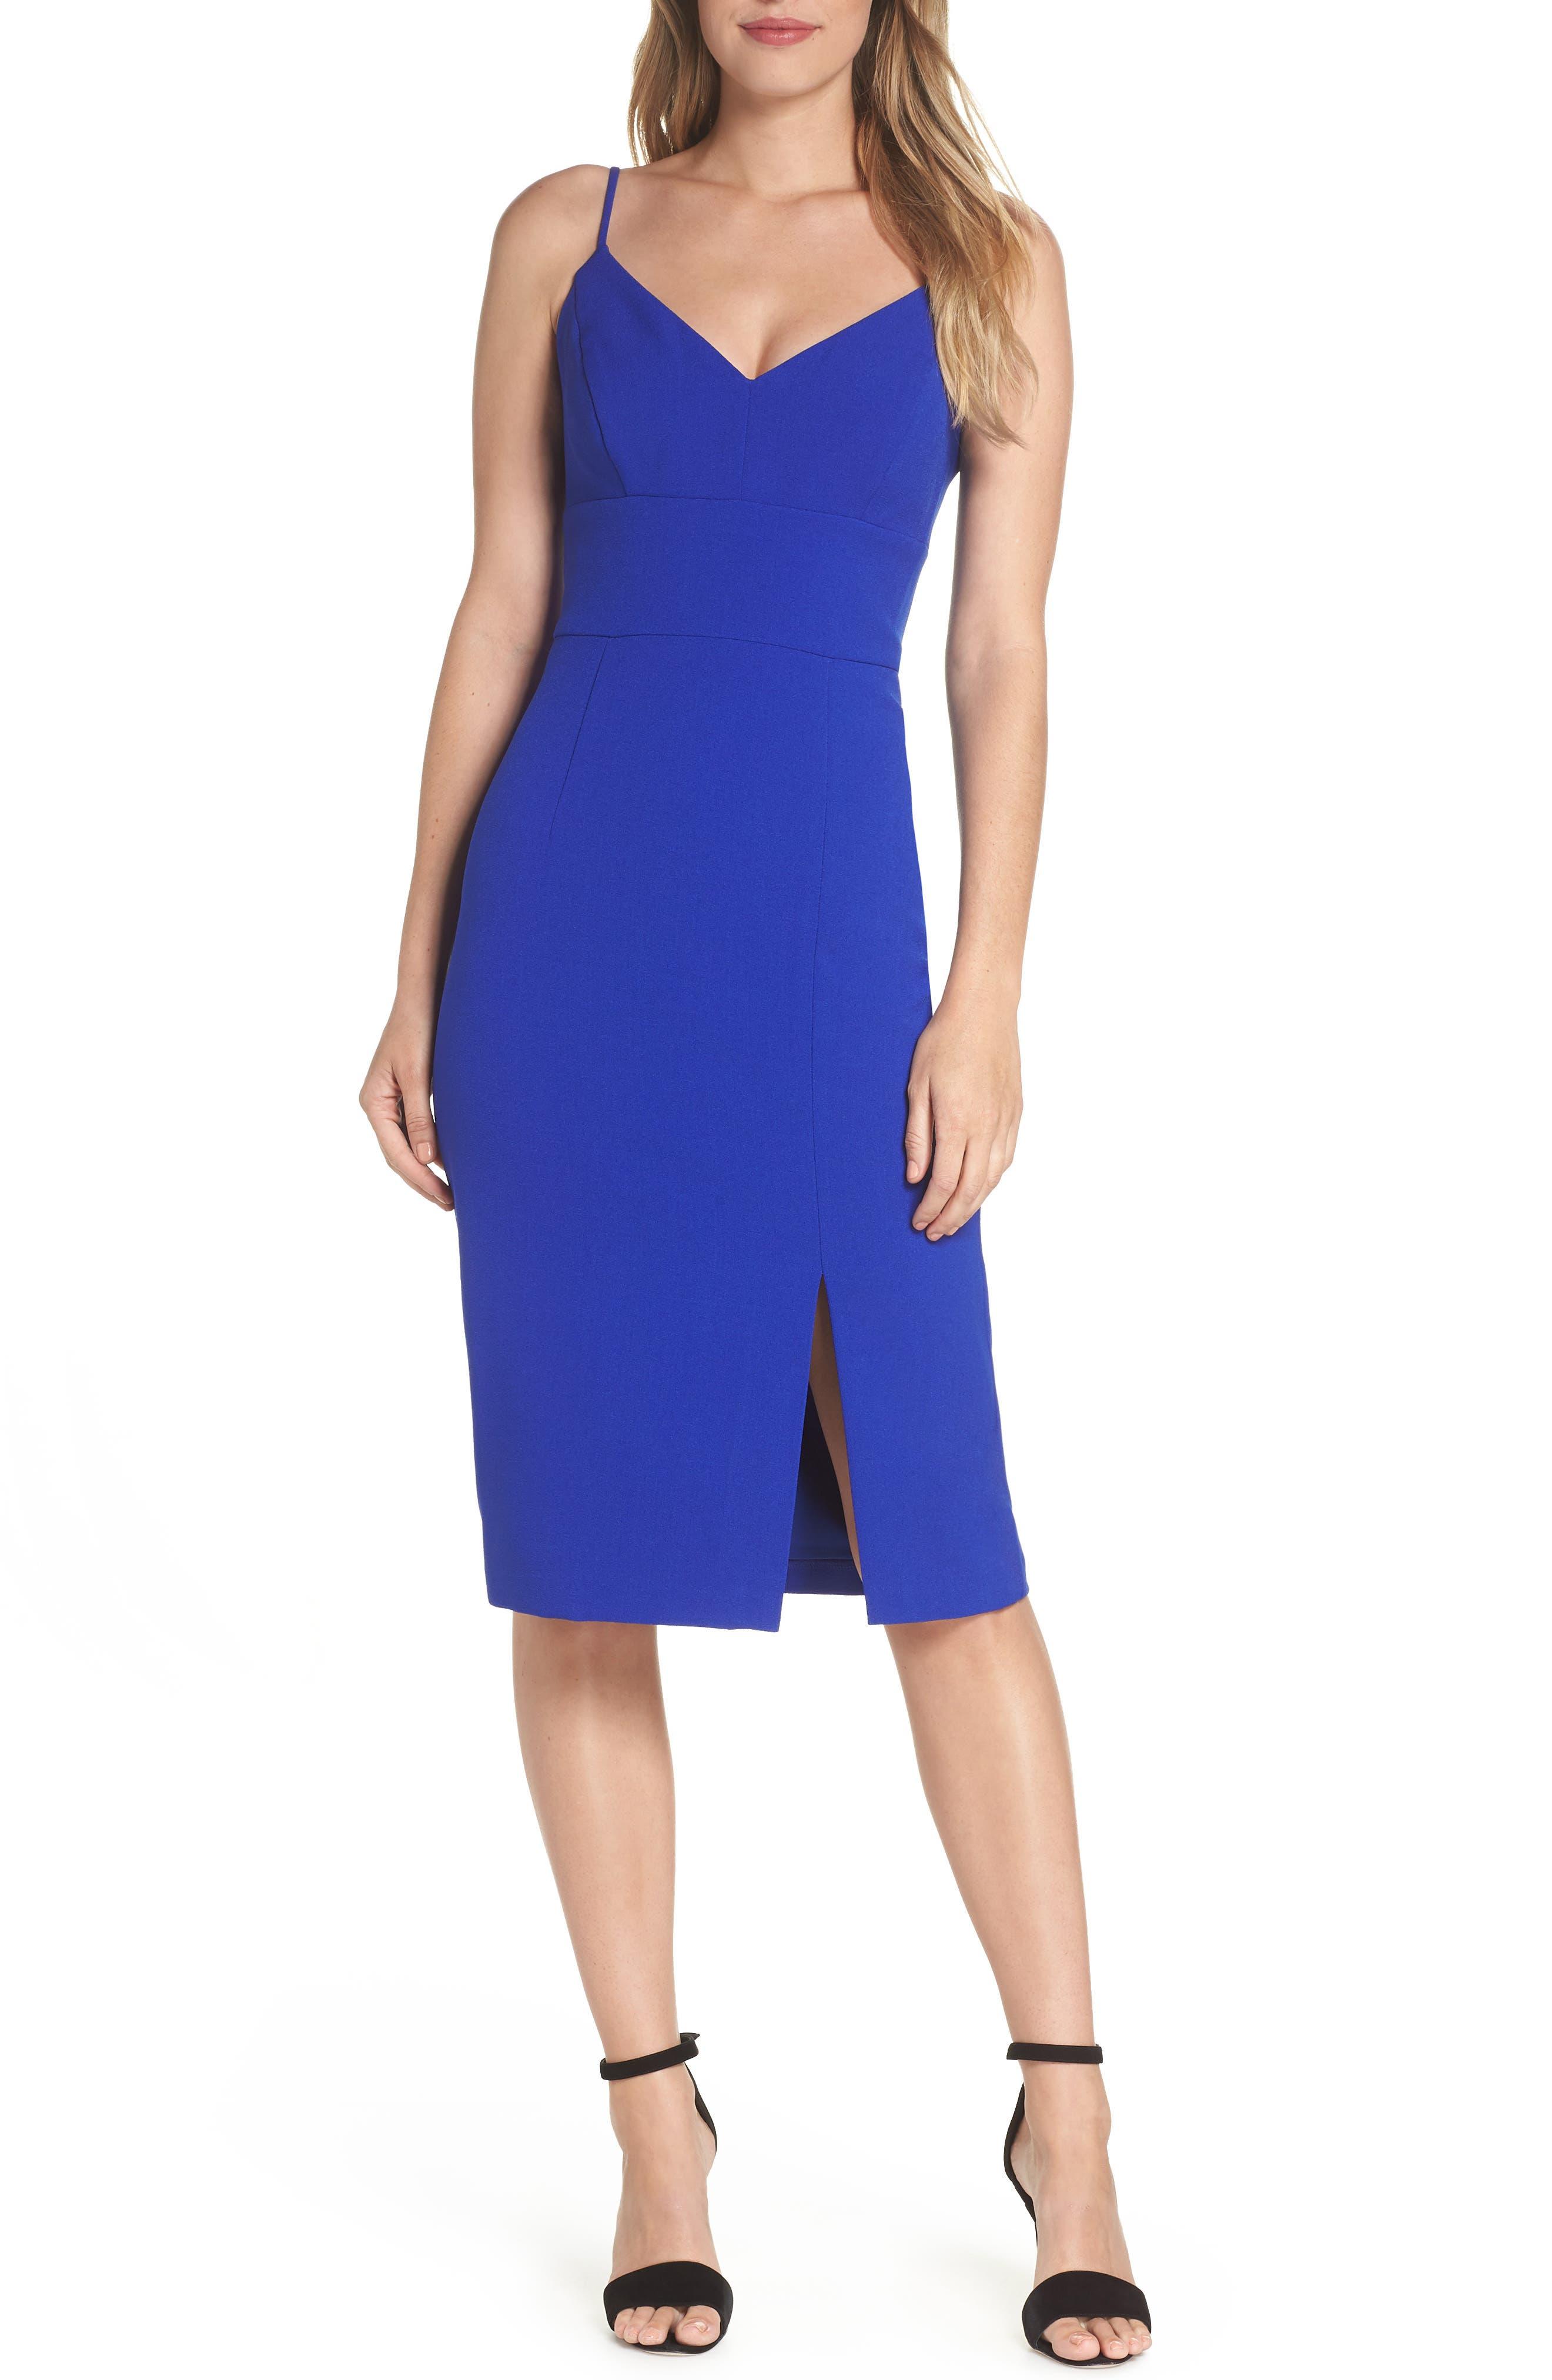 Eliza J Sleeveless Cocktail Dress, 8 (similar to 1) - Blue